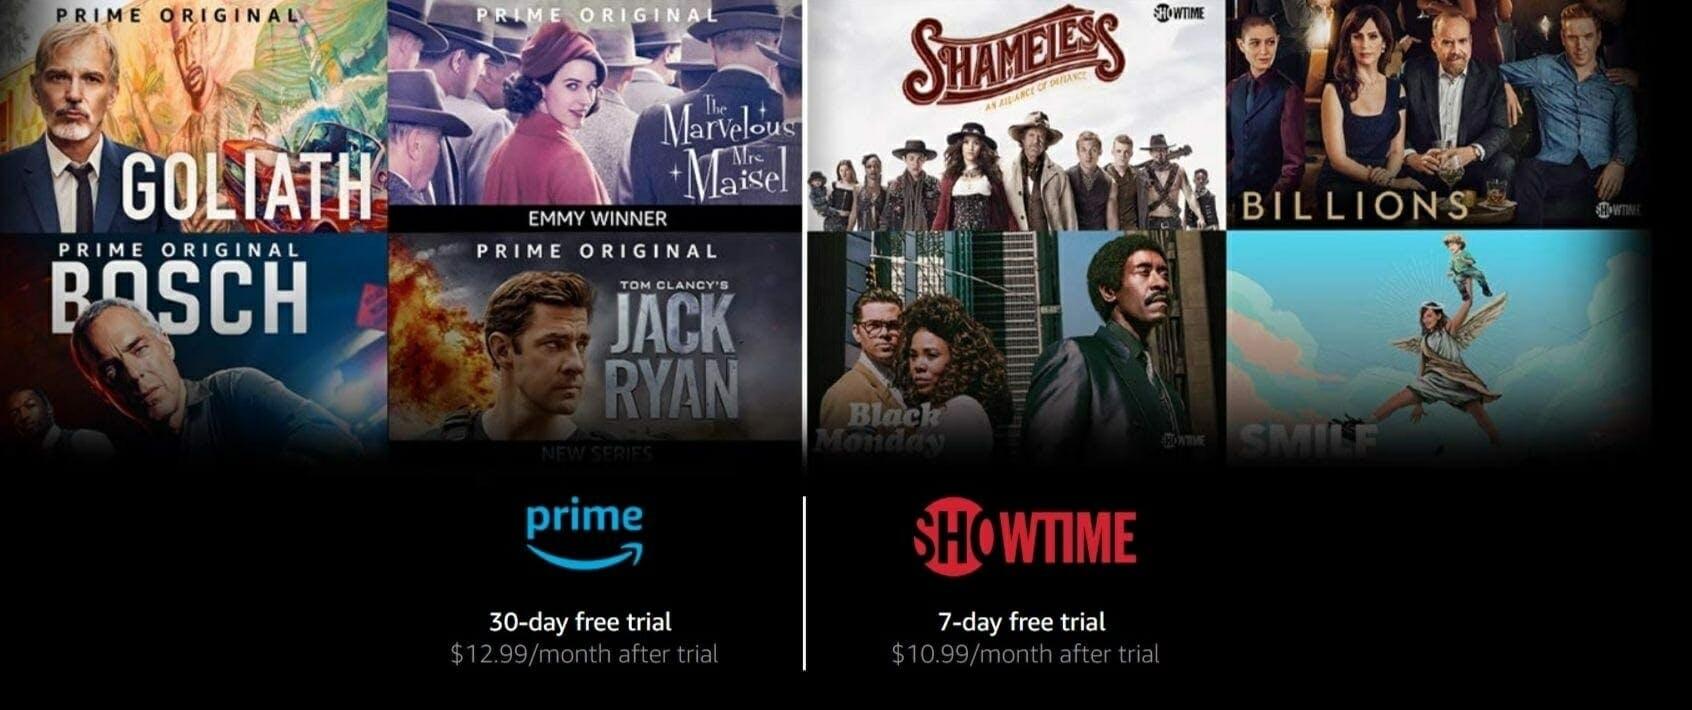 Wilder vs Breazeale live stream Showtime Amazon